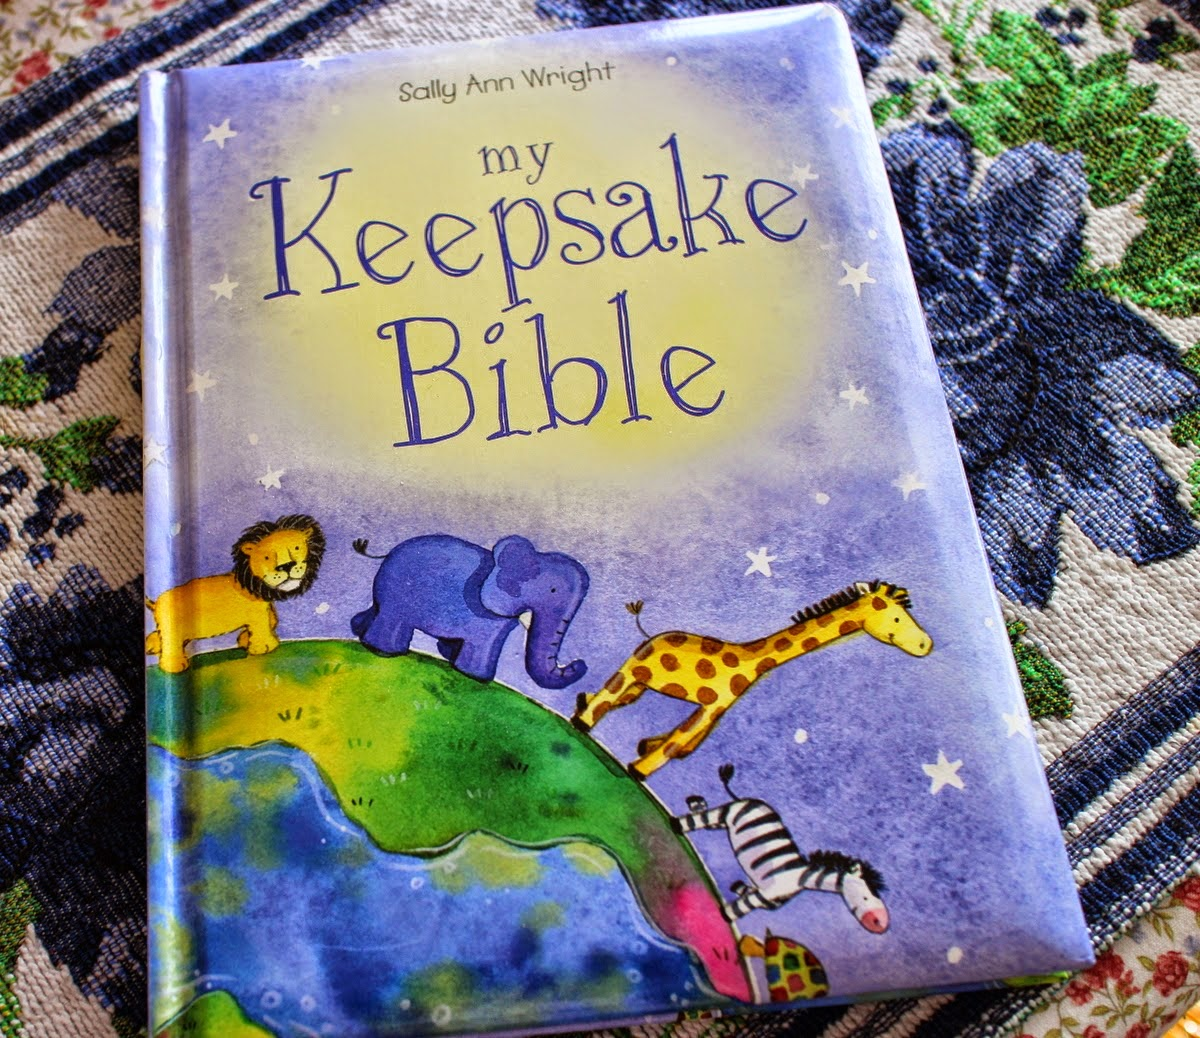 http://lilacsandspringtime.blogspot.com/2015/03/my-keepsake-bible.html